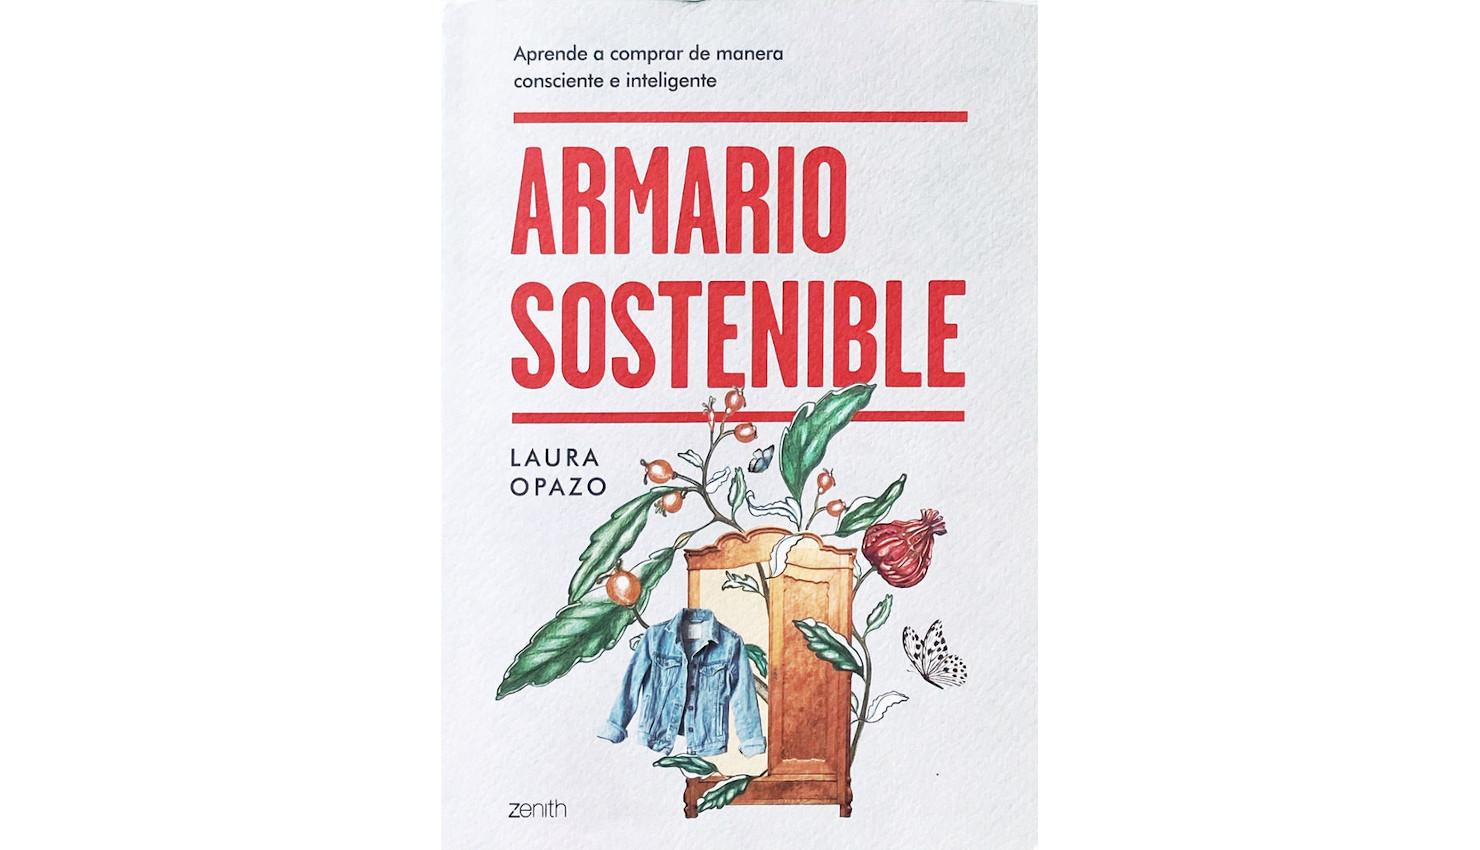 armariosostenible-magazinehorse.jpg